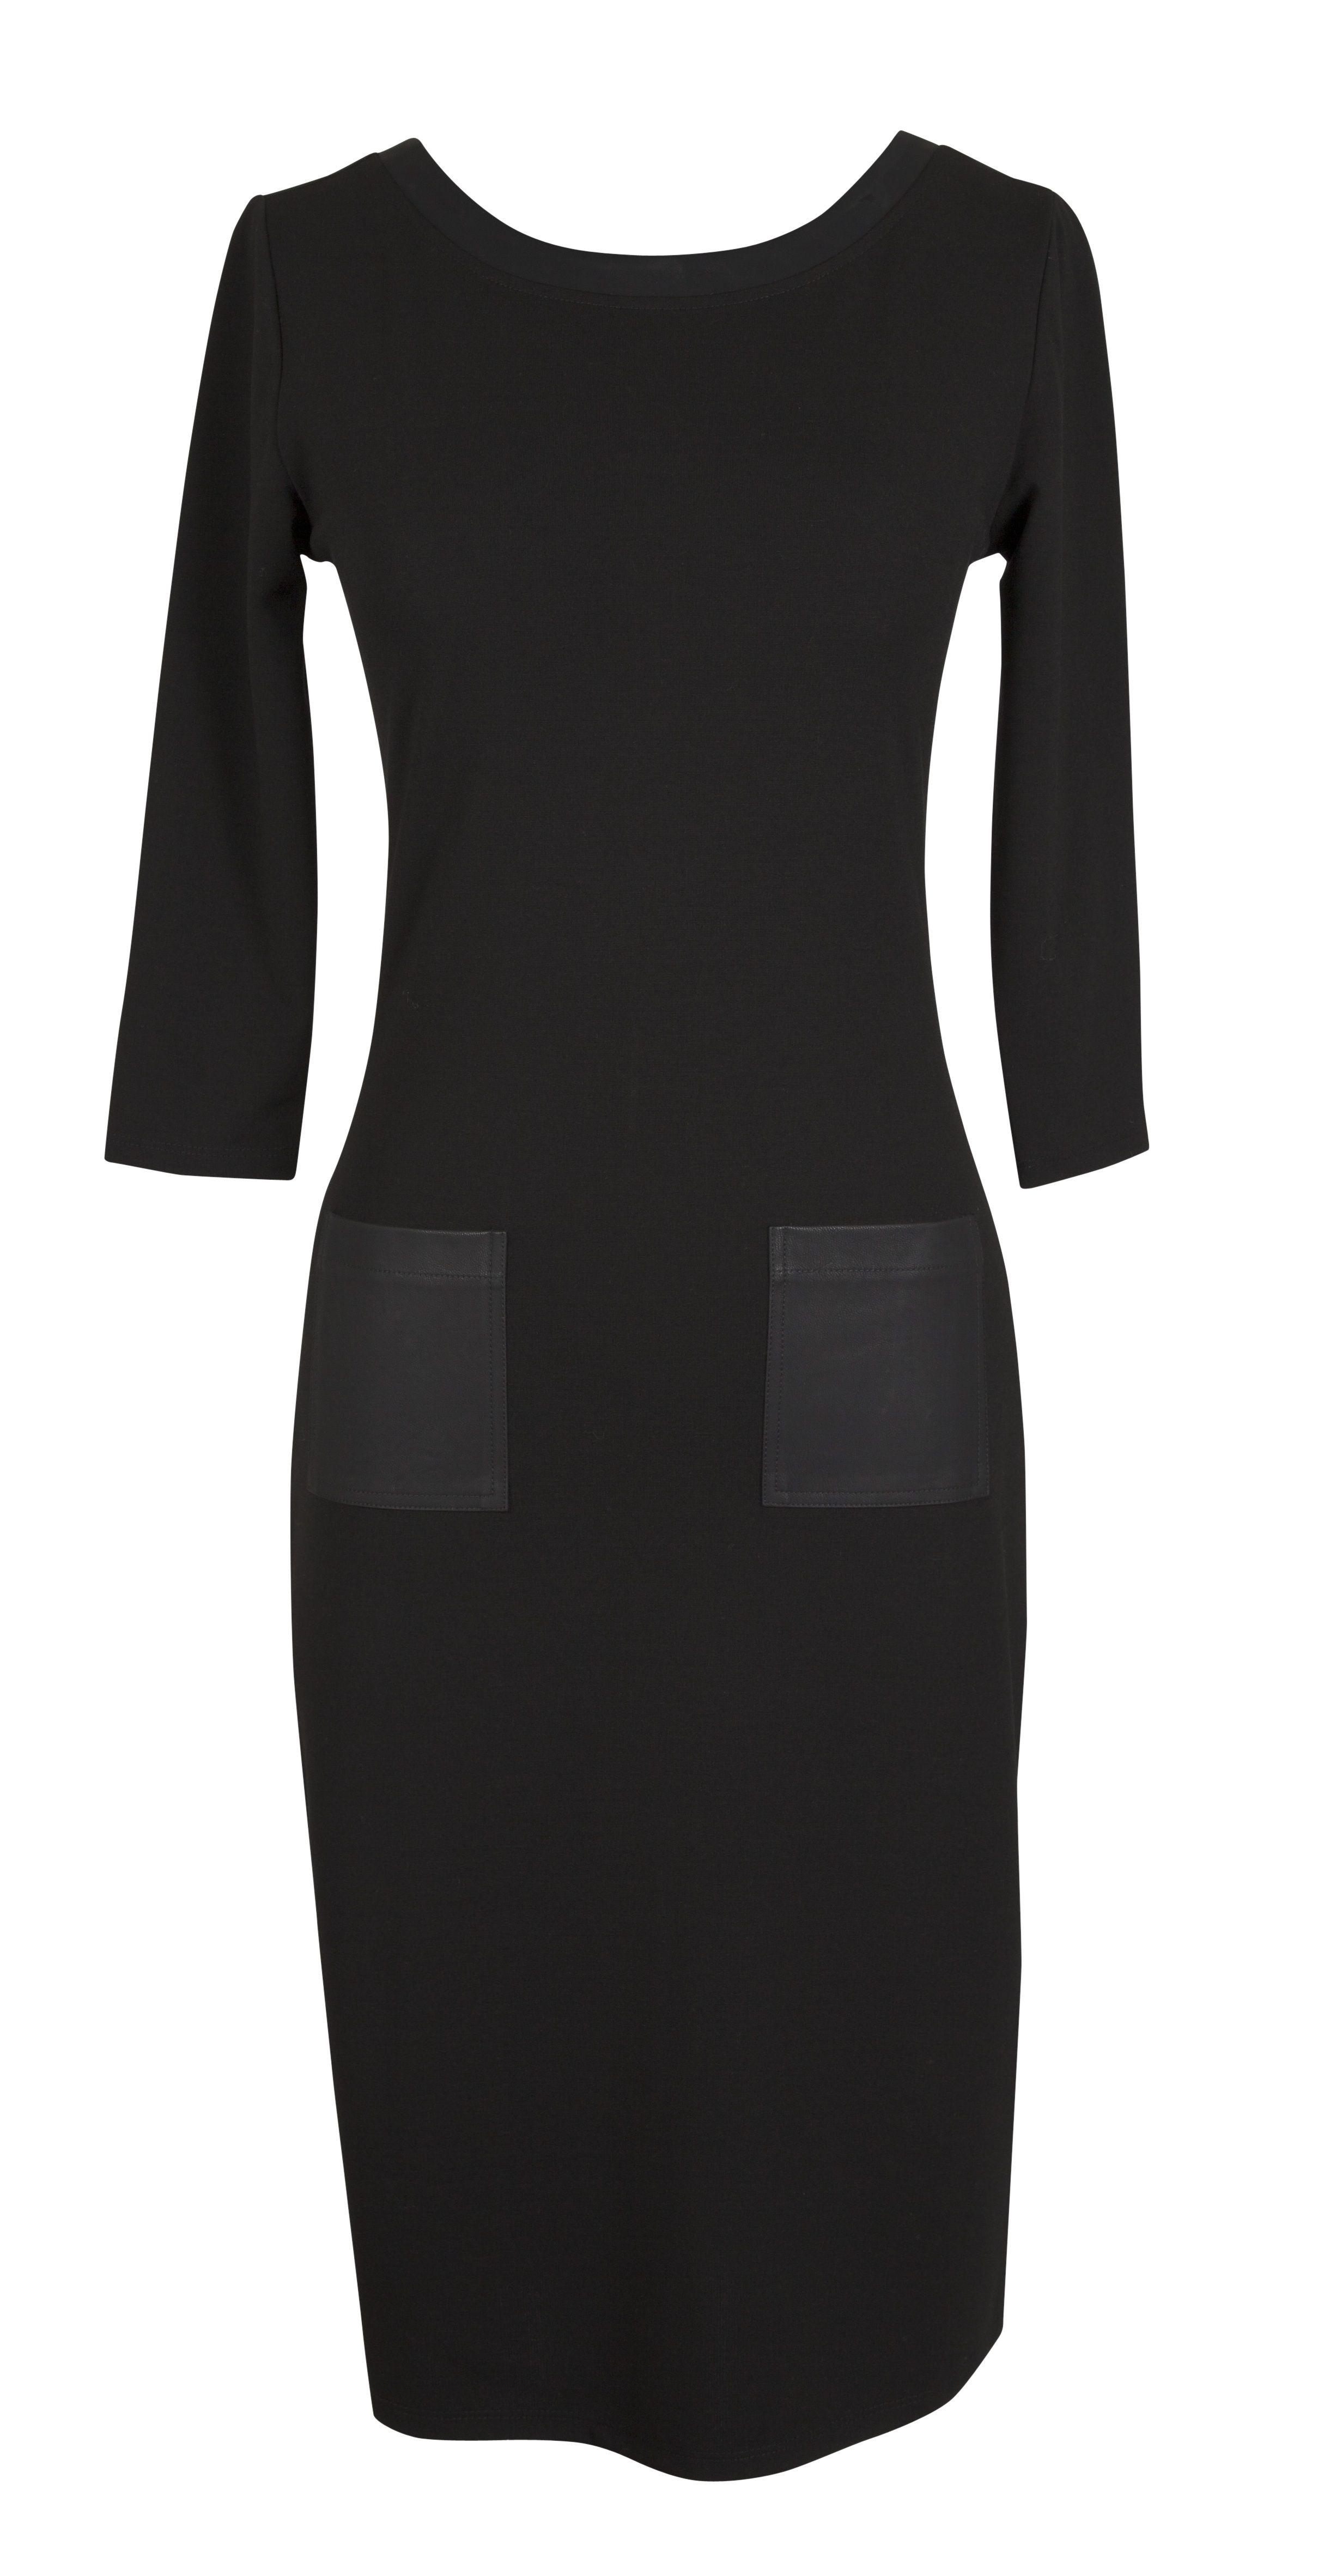 Formal Black Sleeve Dress With Leather Pocket Detail Dresses Black Dress With Sleeves Nice Dresses [ 4727 x 2452 Pixel ]